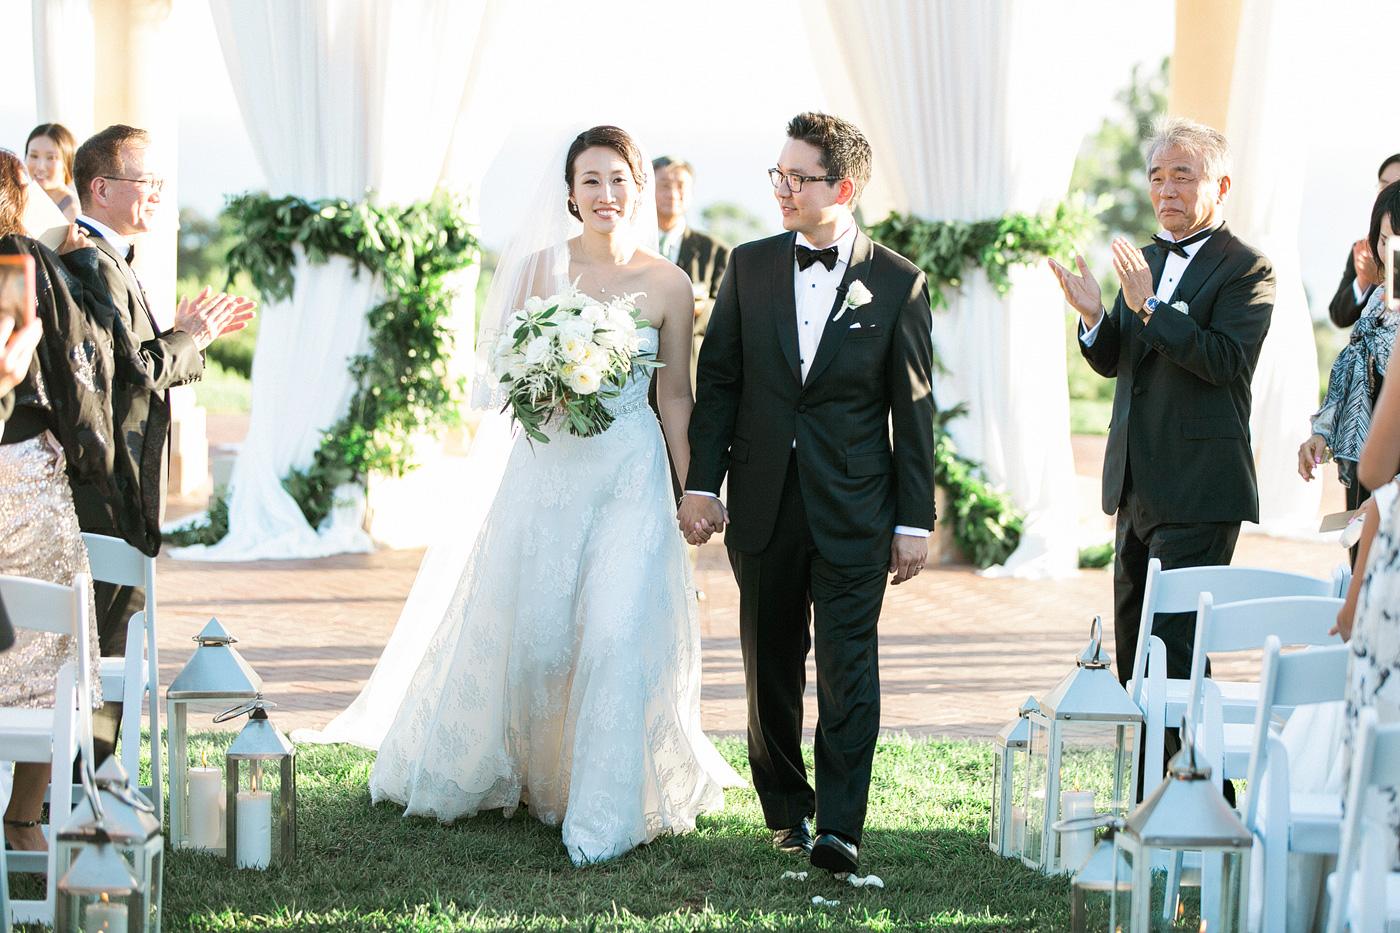 Pelican-hill-wedding-19